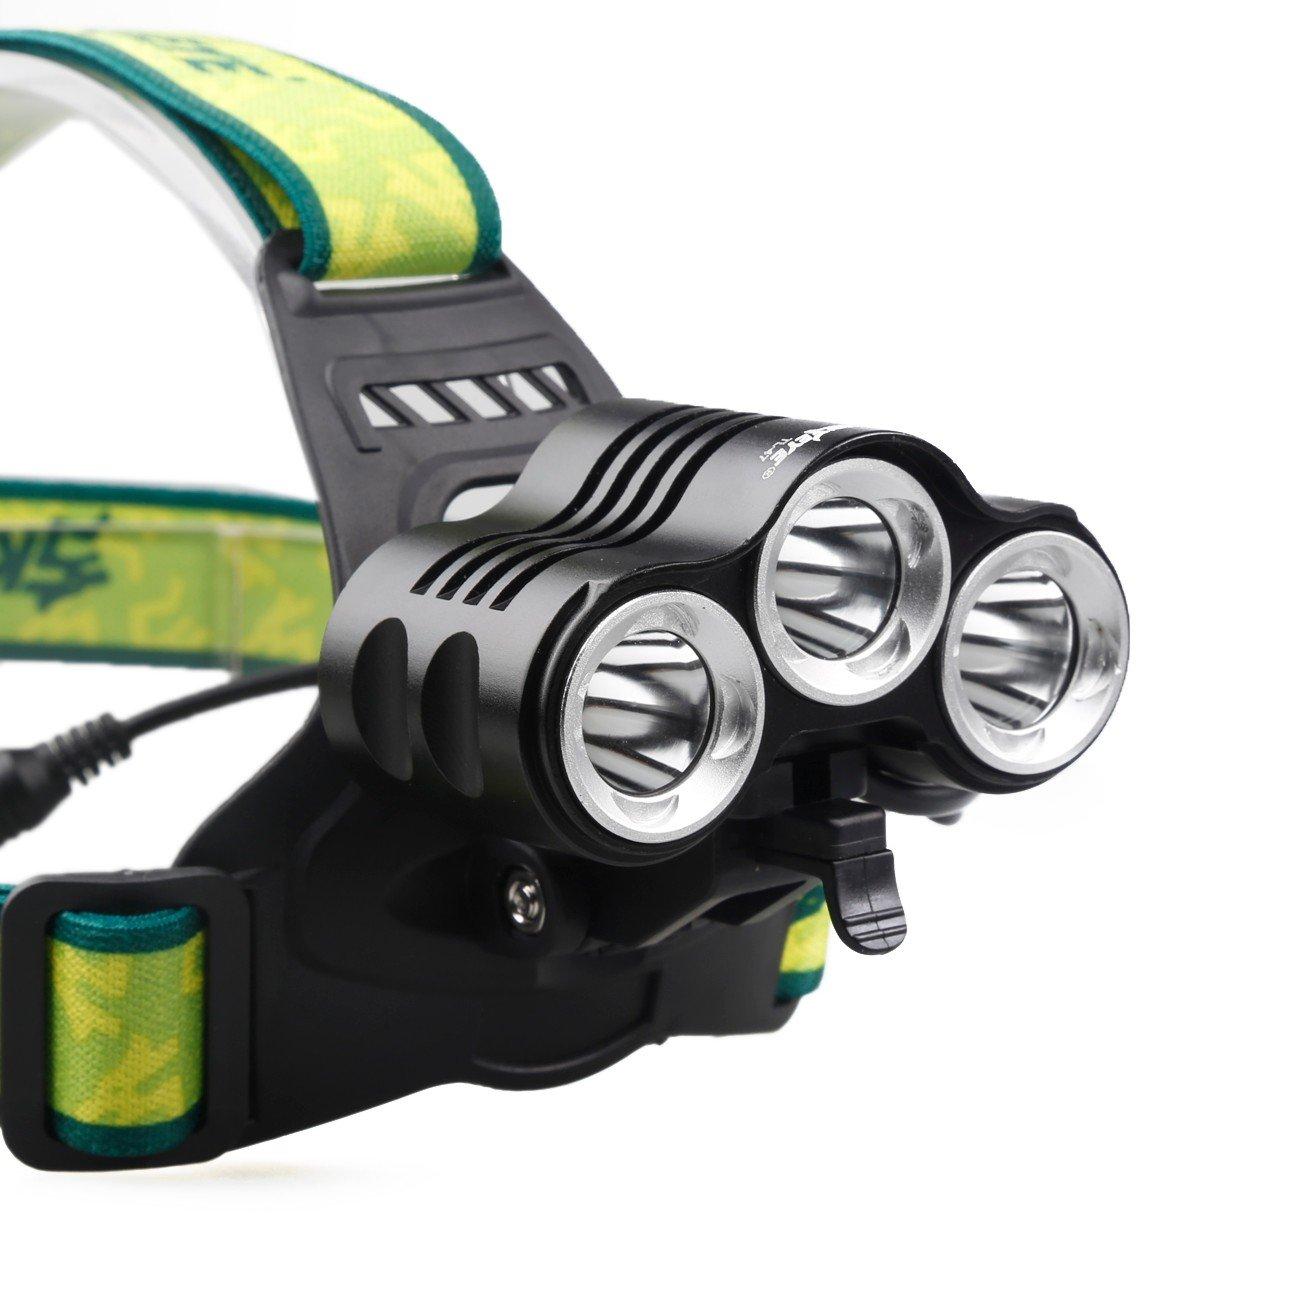 Carrera Excursi/ón Ciclismo Pesca Linterna L/ámpara Frontal Heligen Flashlight Garant/ía de Producto 4Modes 6000Lm 3X XML T6+2R5 LED Headlamp Head Light Torch USB 18650+Car Charger Para Camping Caza